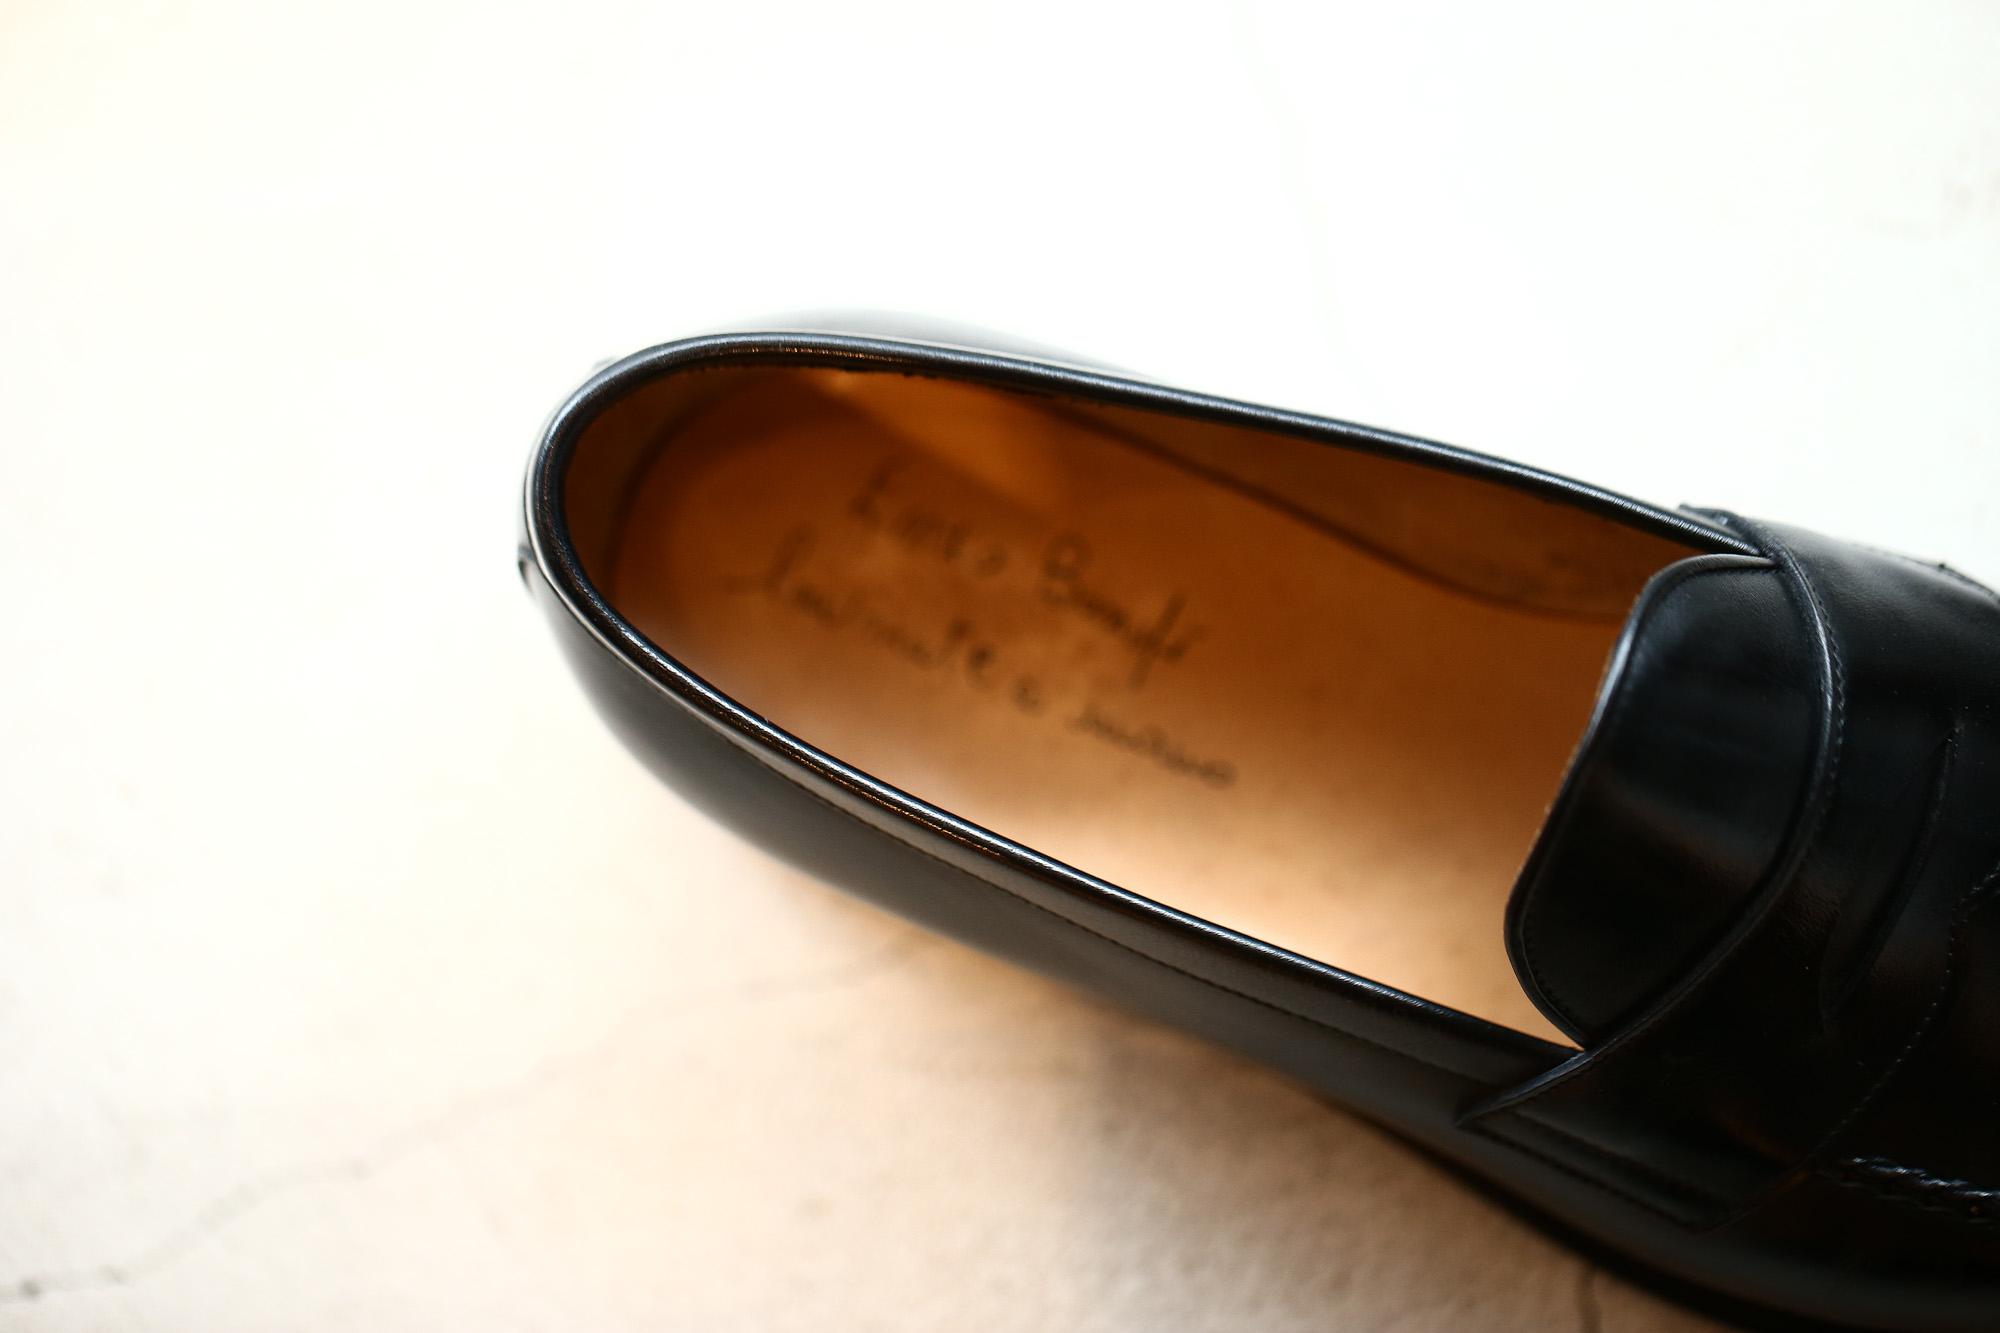 ENZO BONAFE(エンツォボナフェ) ART.3713 Coin Loafer コインローファー Crocodile クロコダイル エキゾチックレザーシューズ BLACK・999(ブラック・999) made in italy(イタリア製) 2018春夏 enozobonafe クロコ クロコローファー 愛知 名古屋 ZODIAC ゾディアック